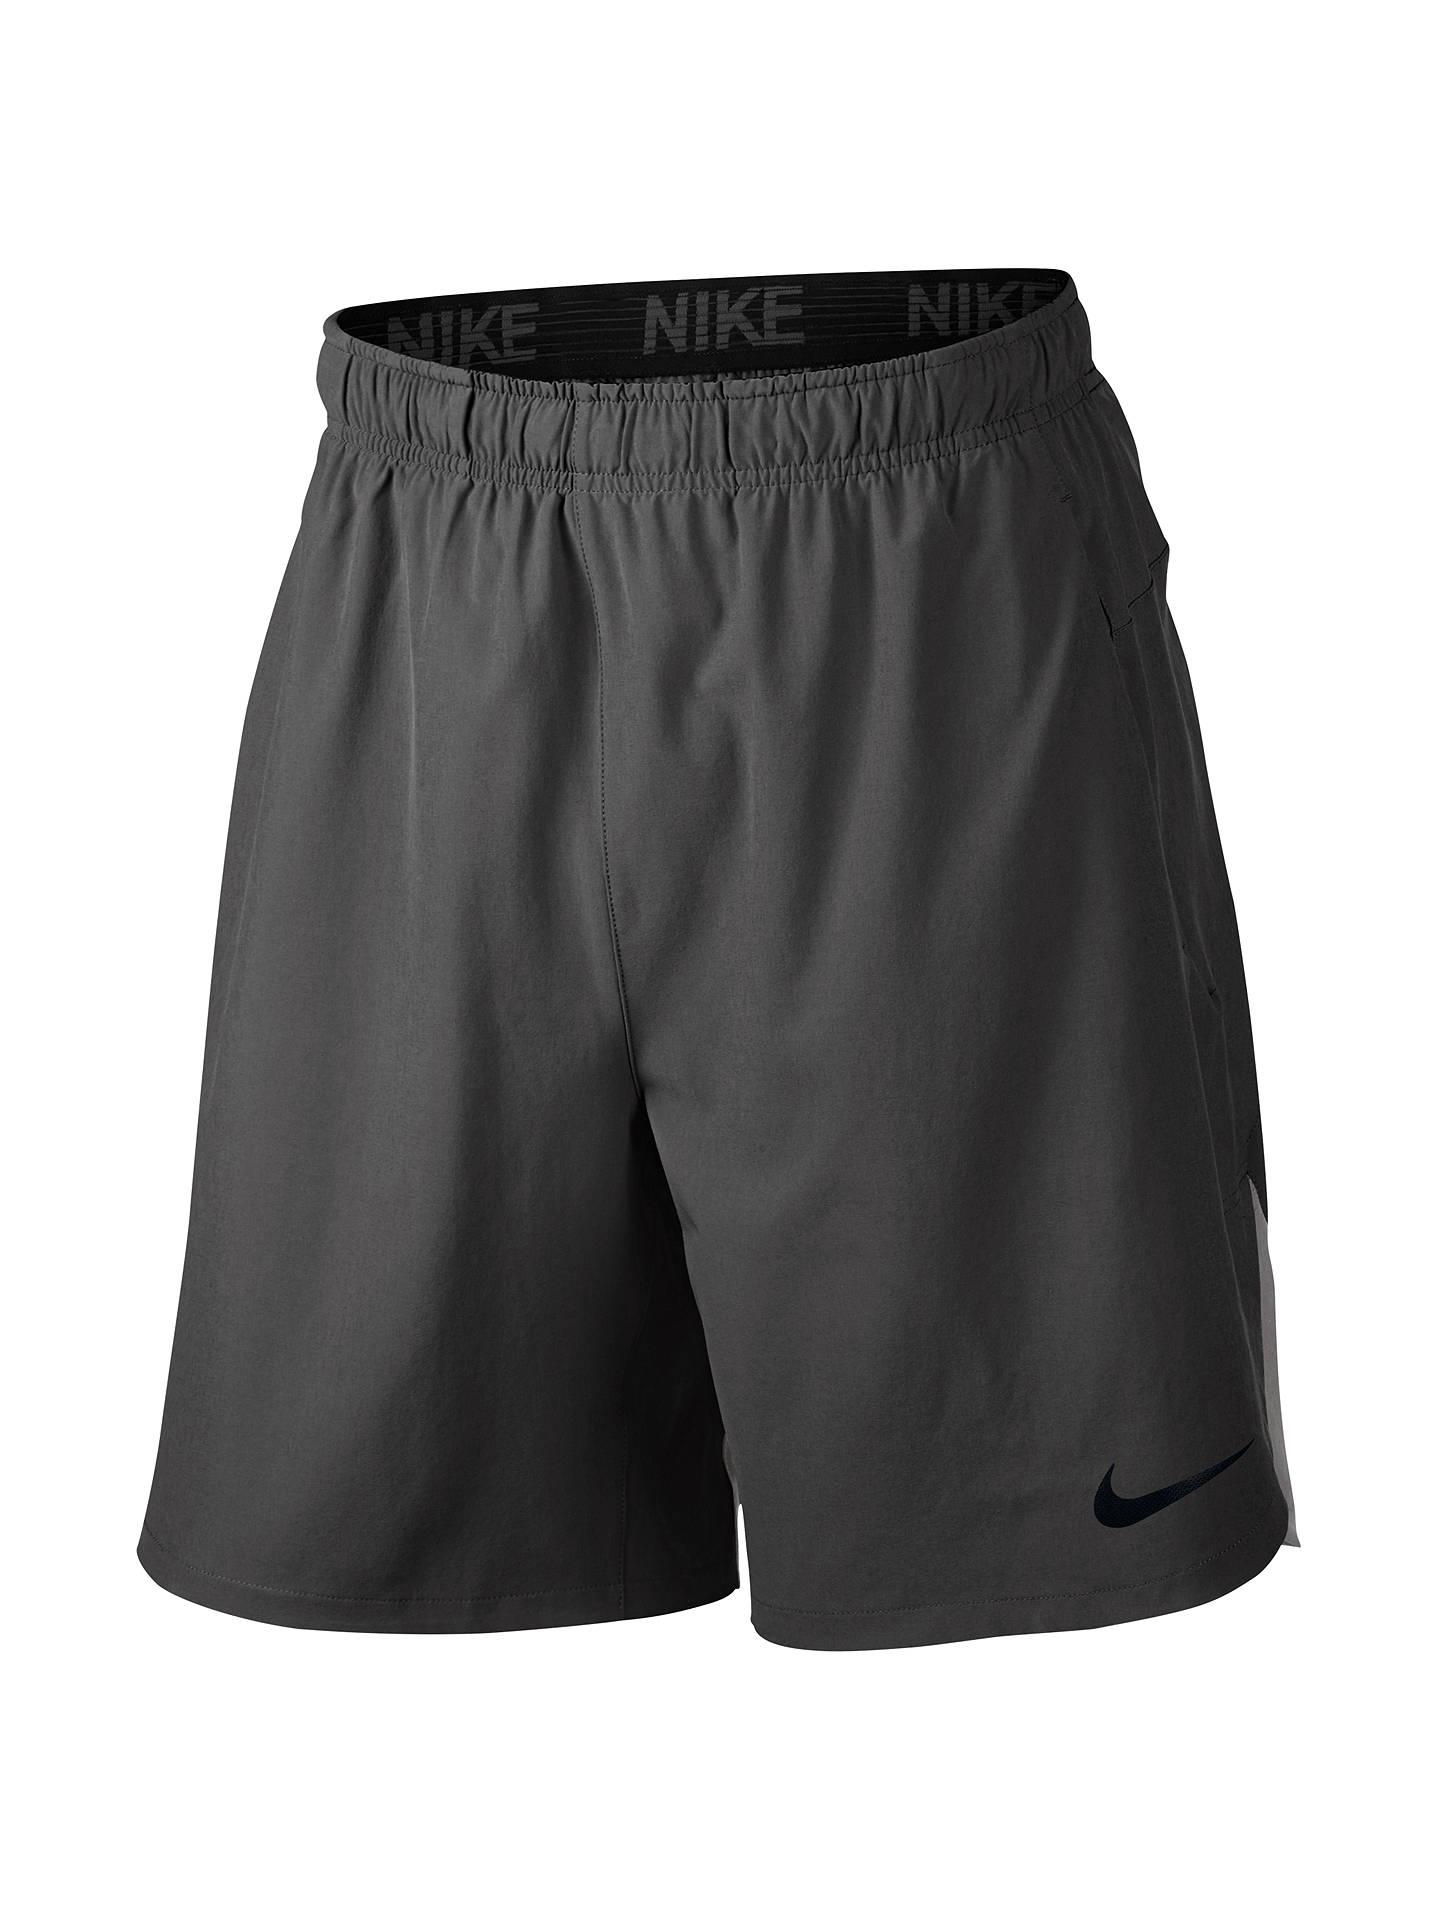 059ea0825b5 Nike Flex Contrast Back Hem Training Shorts at John Lewis   Partners